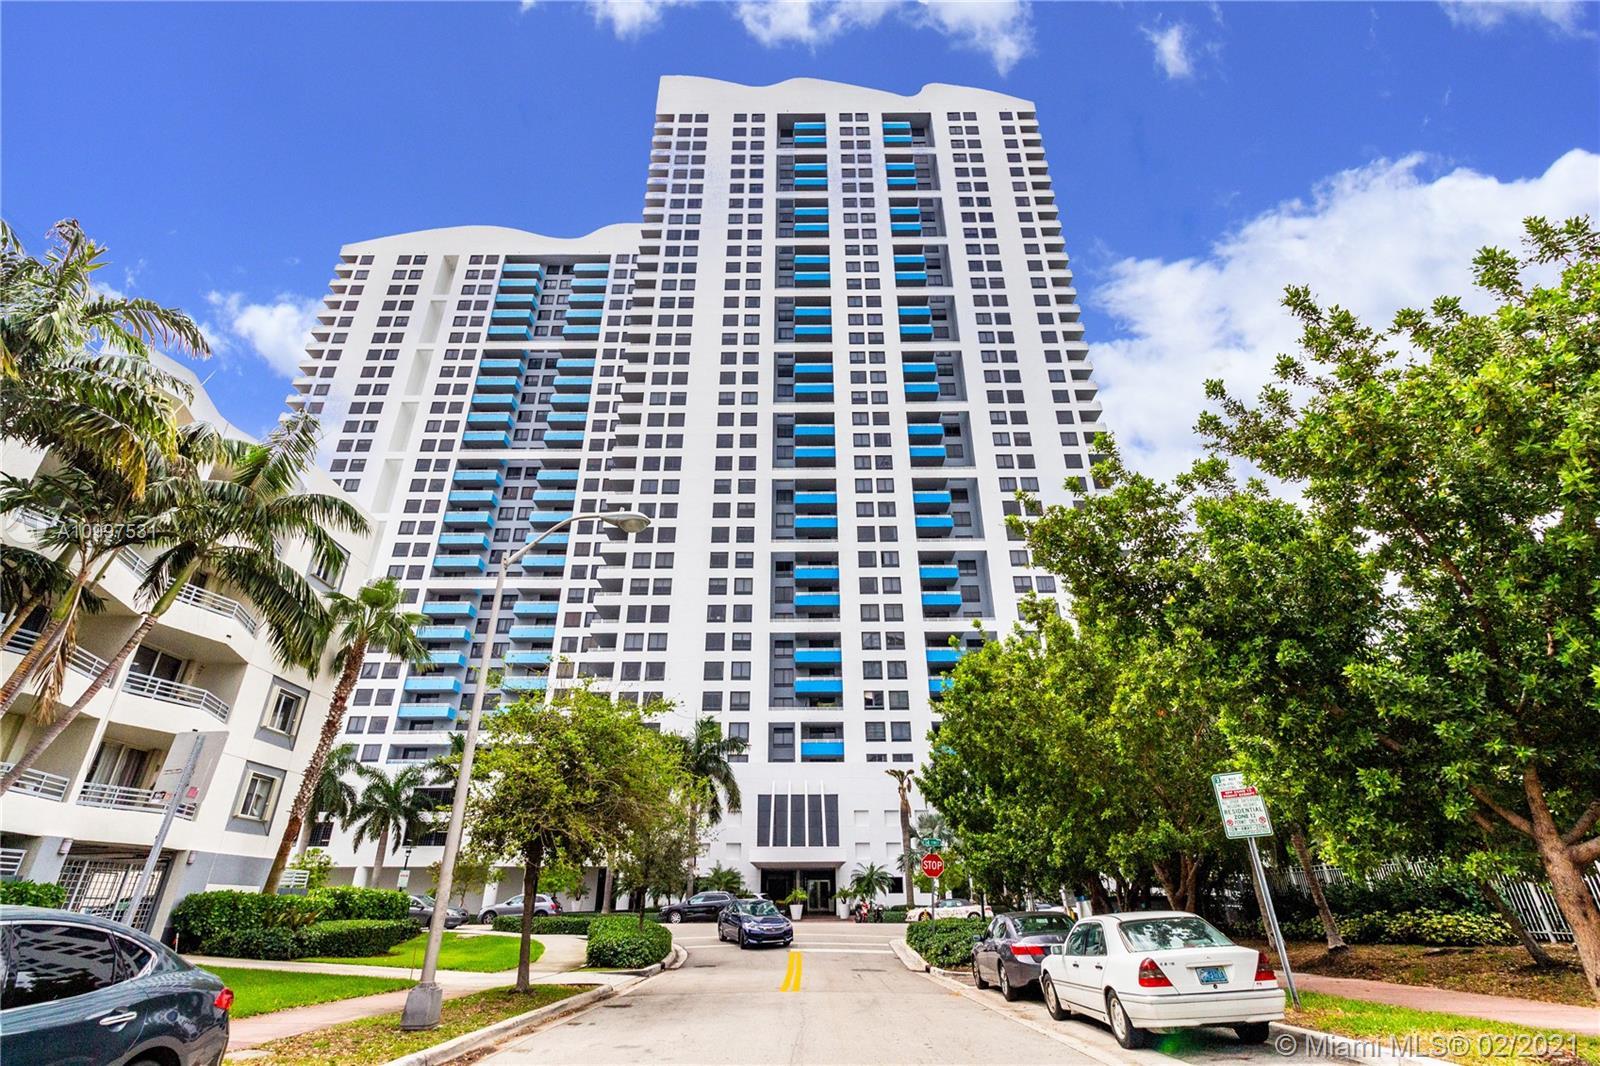 Waverly South Beach #1512 - 1330 West Ave #1512, Miami Beach, FL 33139